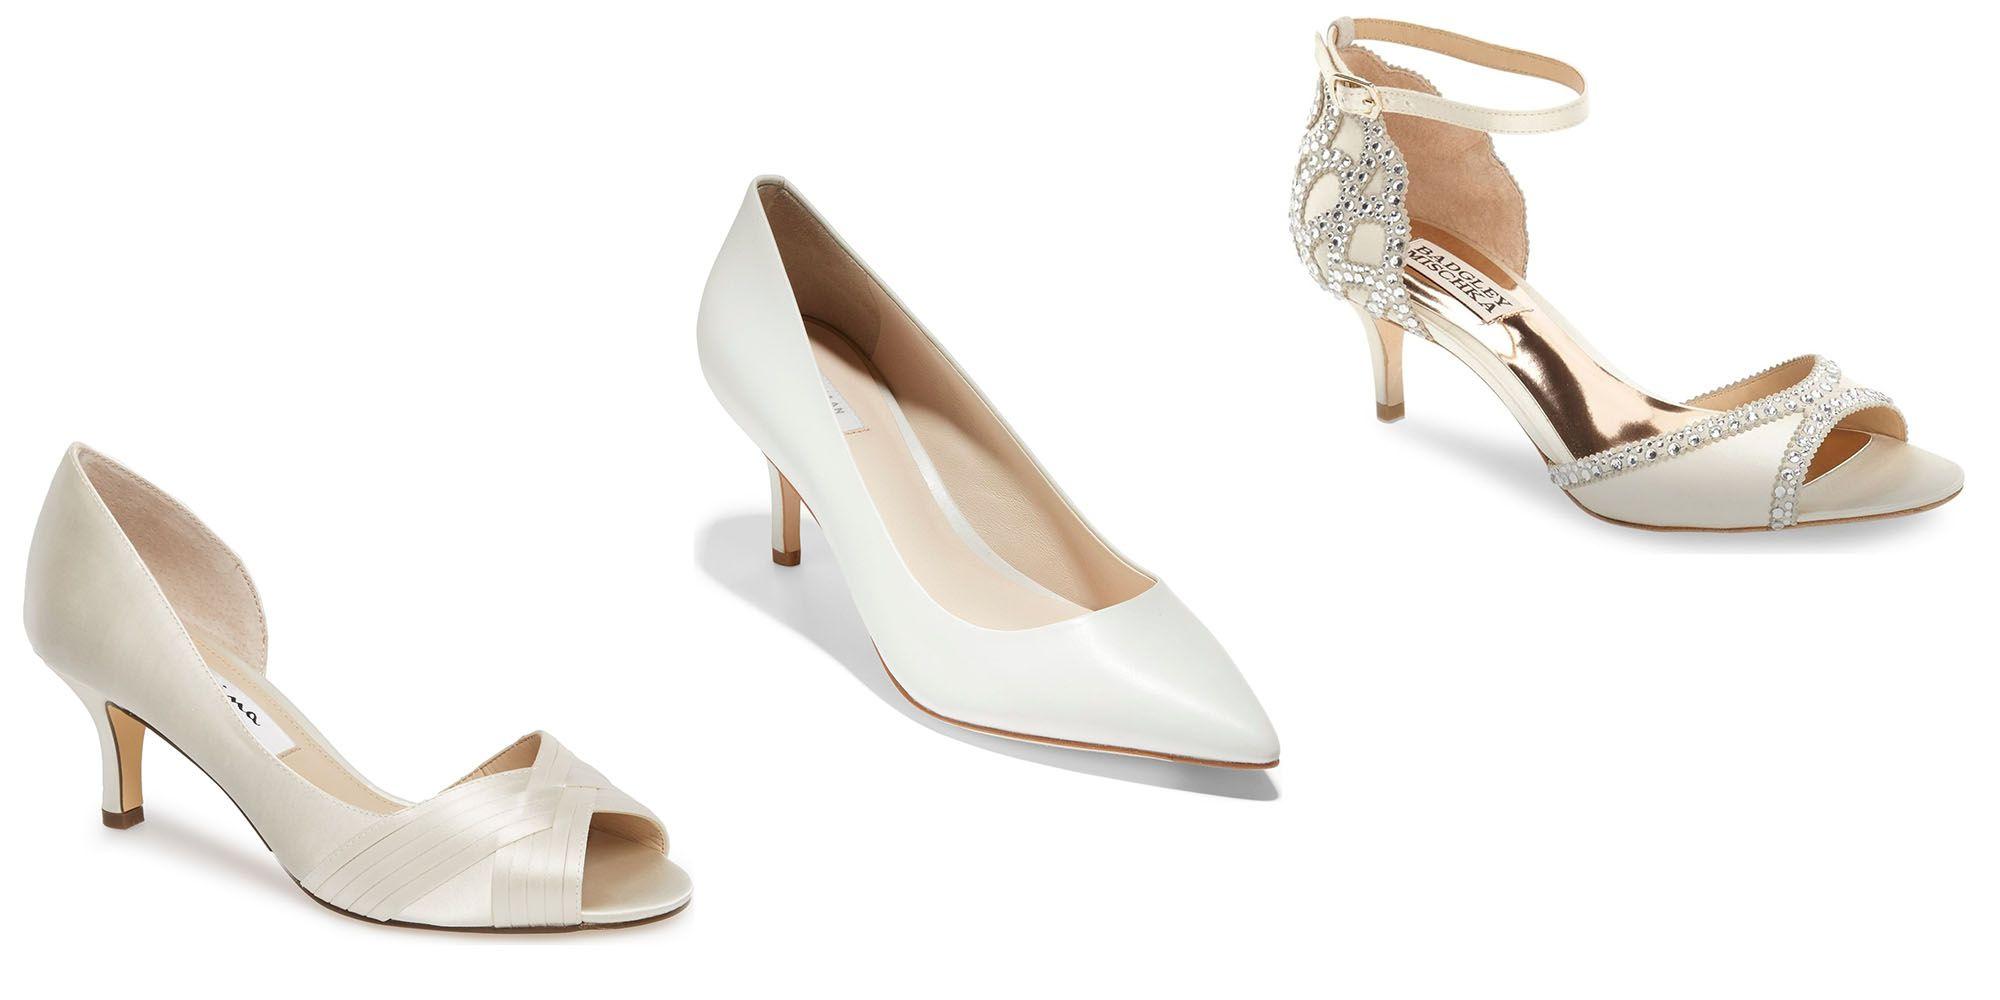 11 Best Comfortable Wedding Shoes Comfy Wedding Heels Wedges